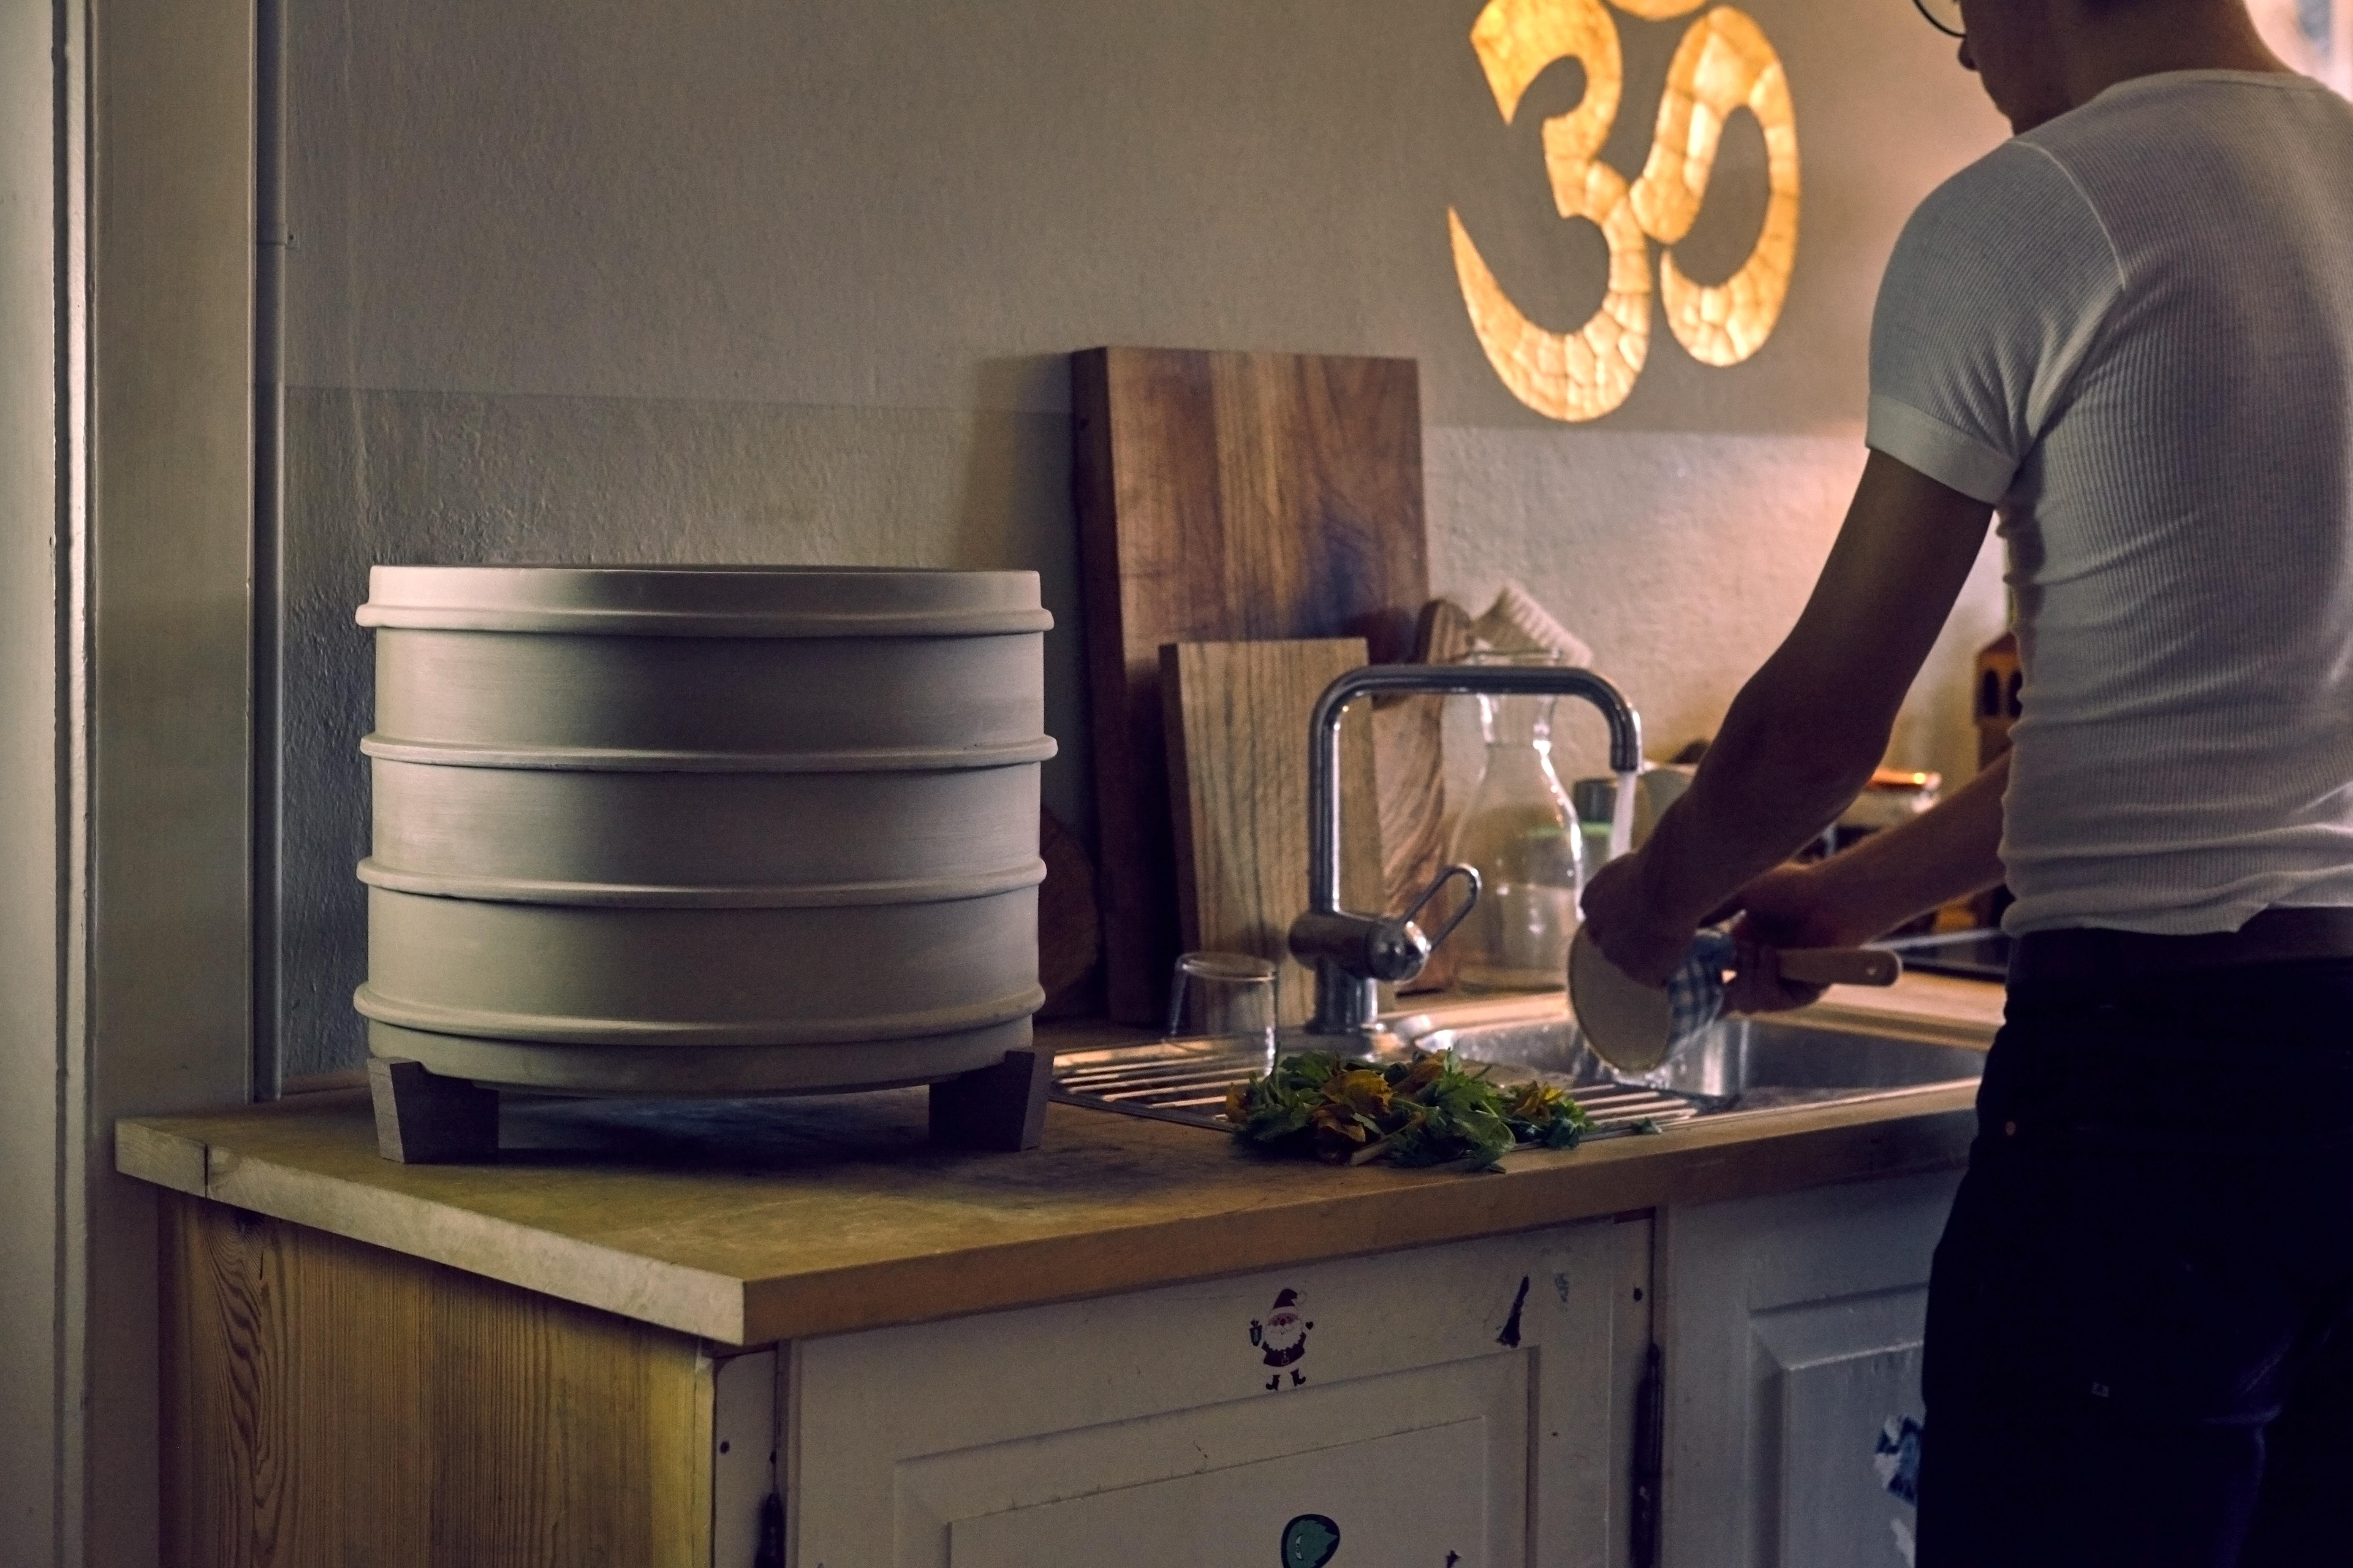 "[Paket] Wurmkomposter ""HOME"" aus atmungsaktivem Ton - Set inkl. 0,5 kg Kompostwürmer und 6 Liter Spezial-Wurmerde"